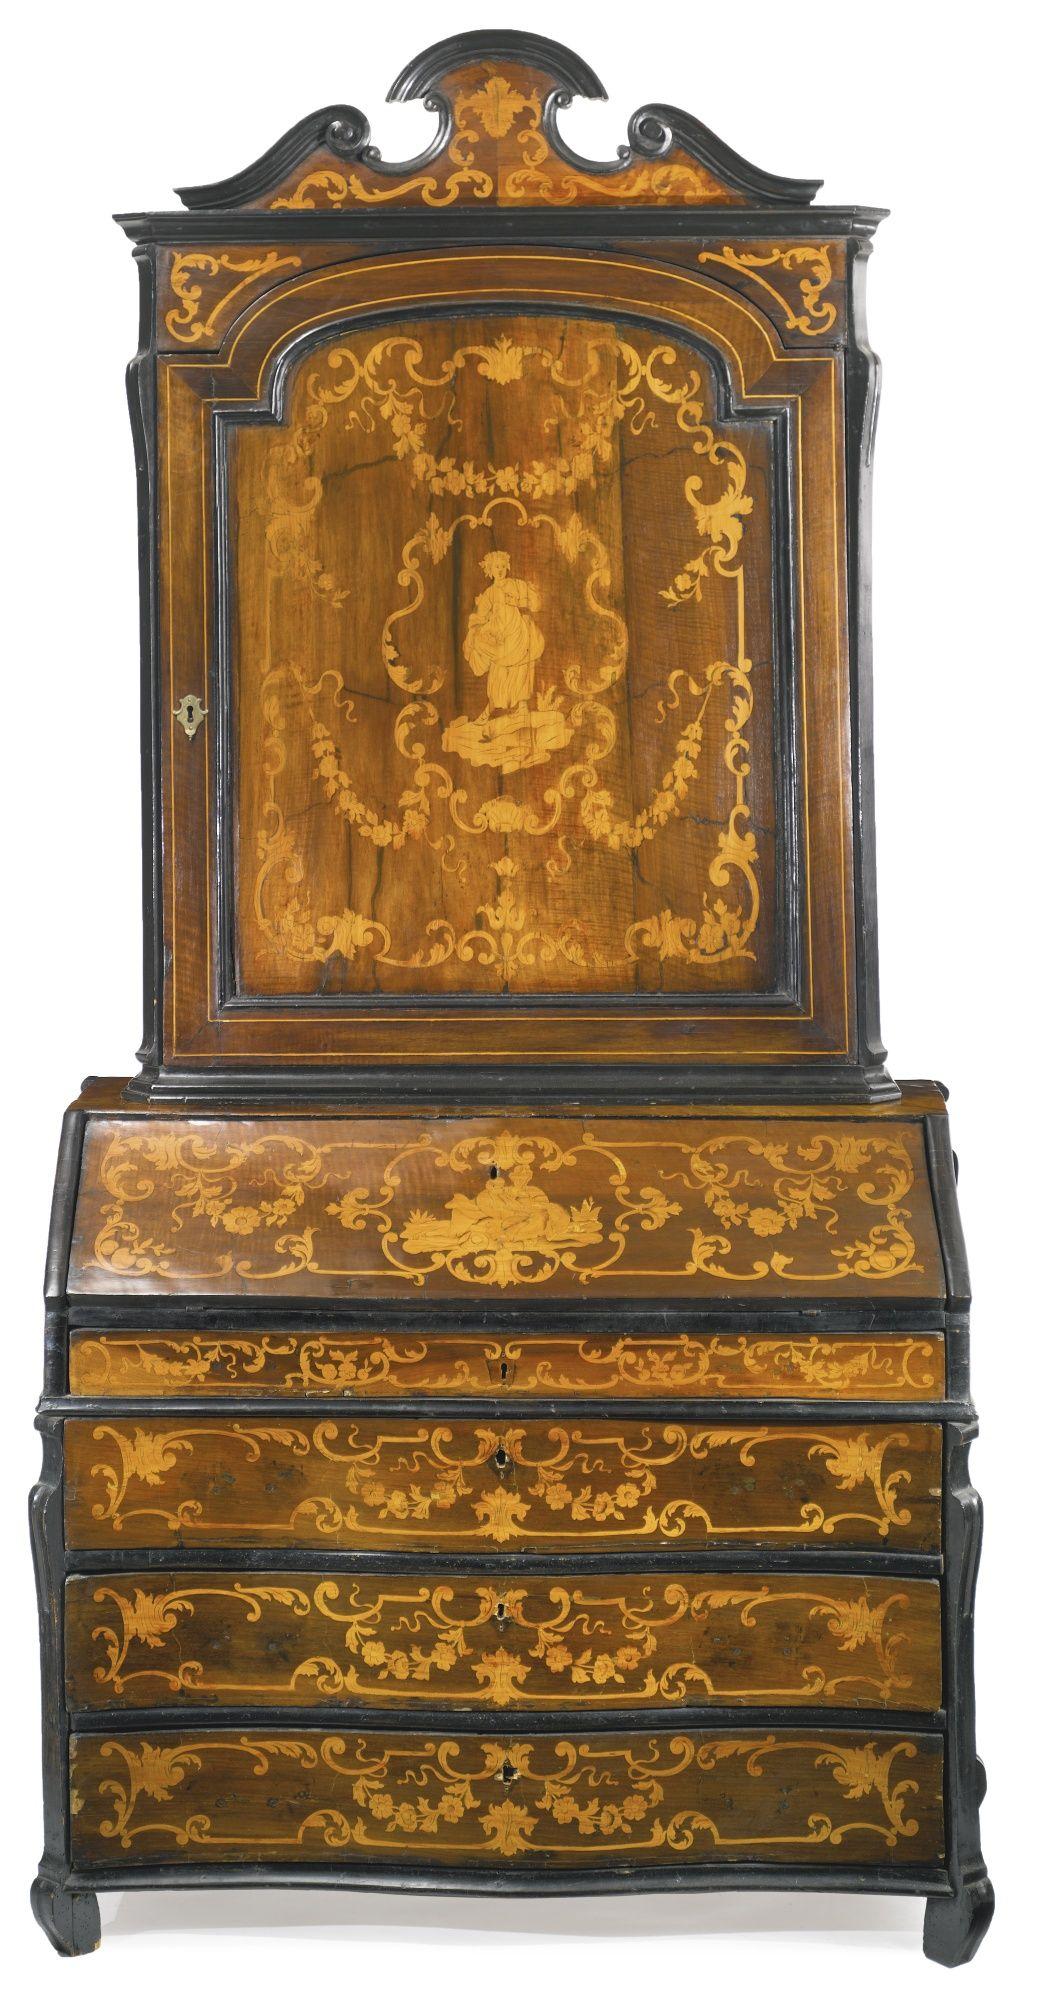 An Italian Rococo Walnut And Fruitwood Marquetry Bureau Cabinet Mid 18th  Century